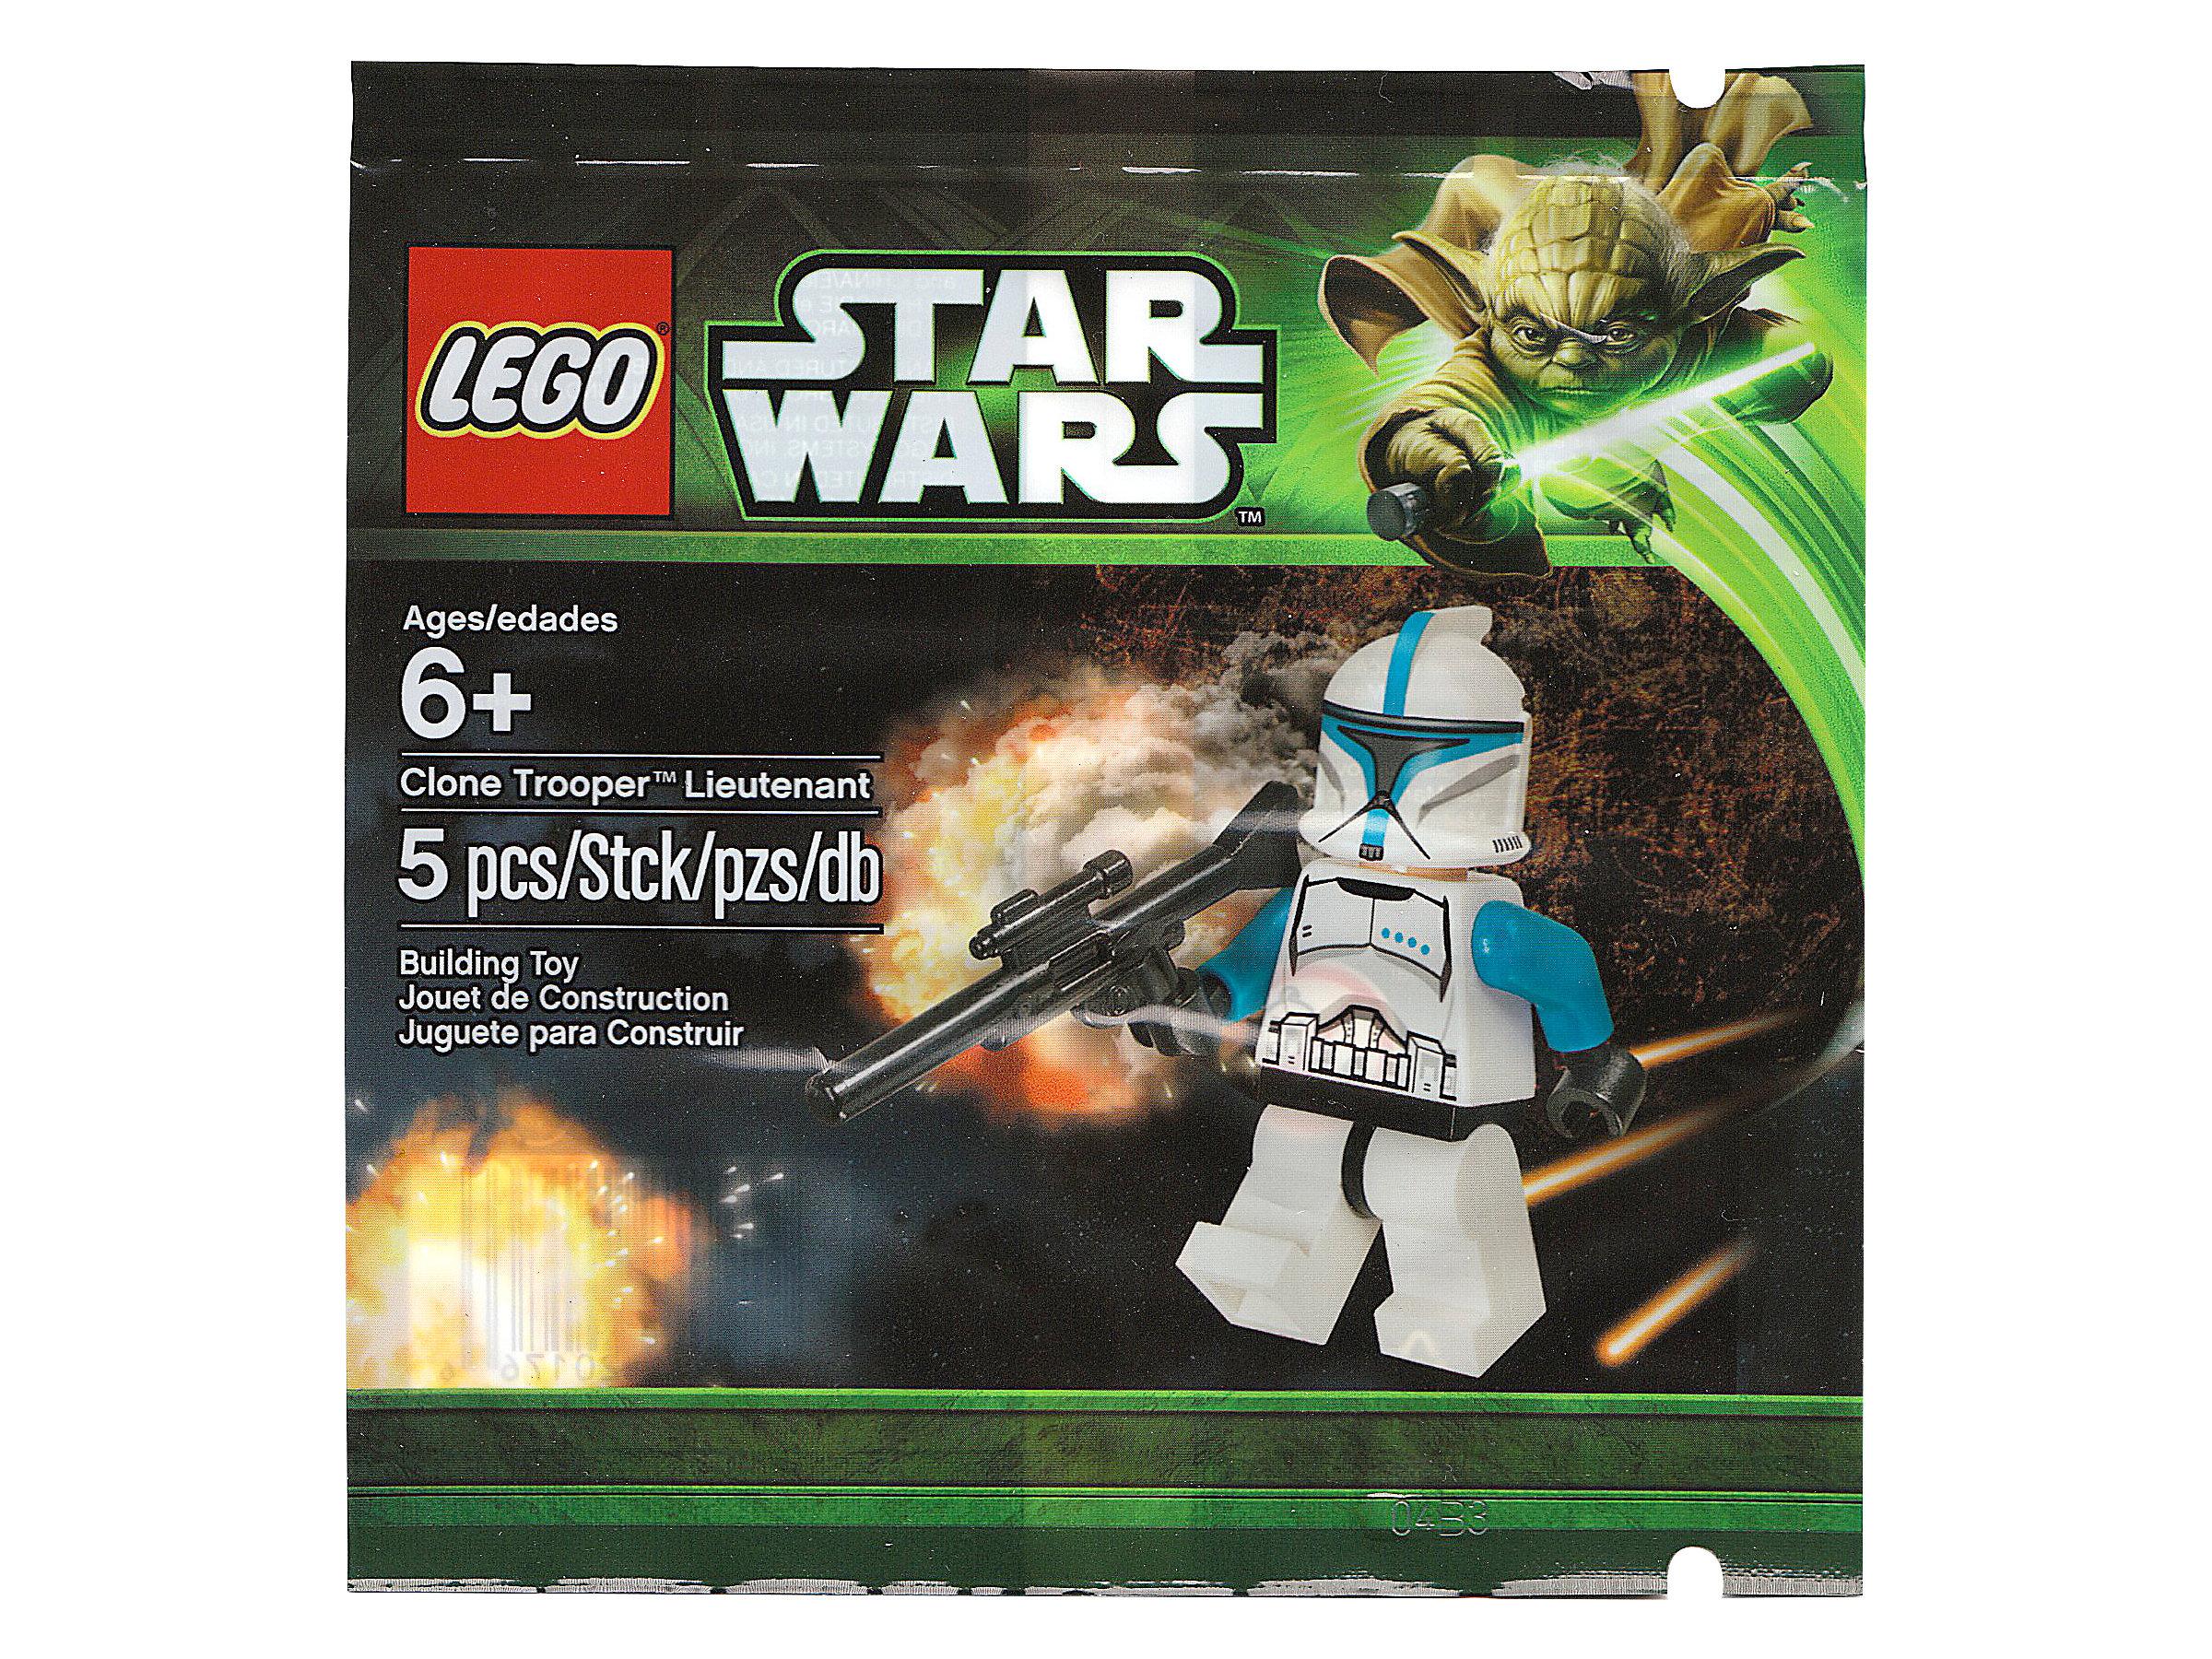 Lego Star Wars Clone Trooper Lieutenant Polybag New Sealed